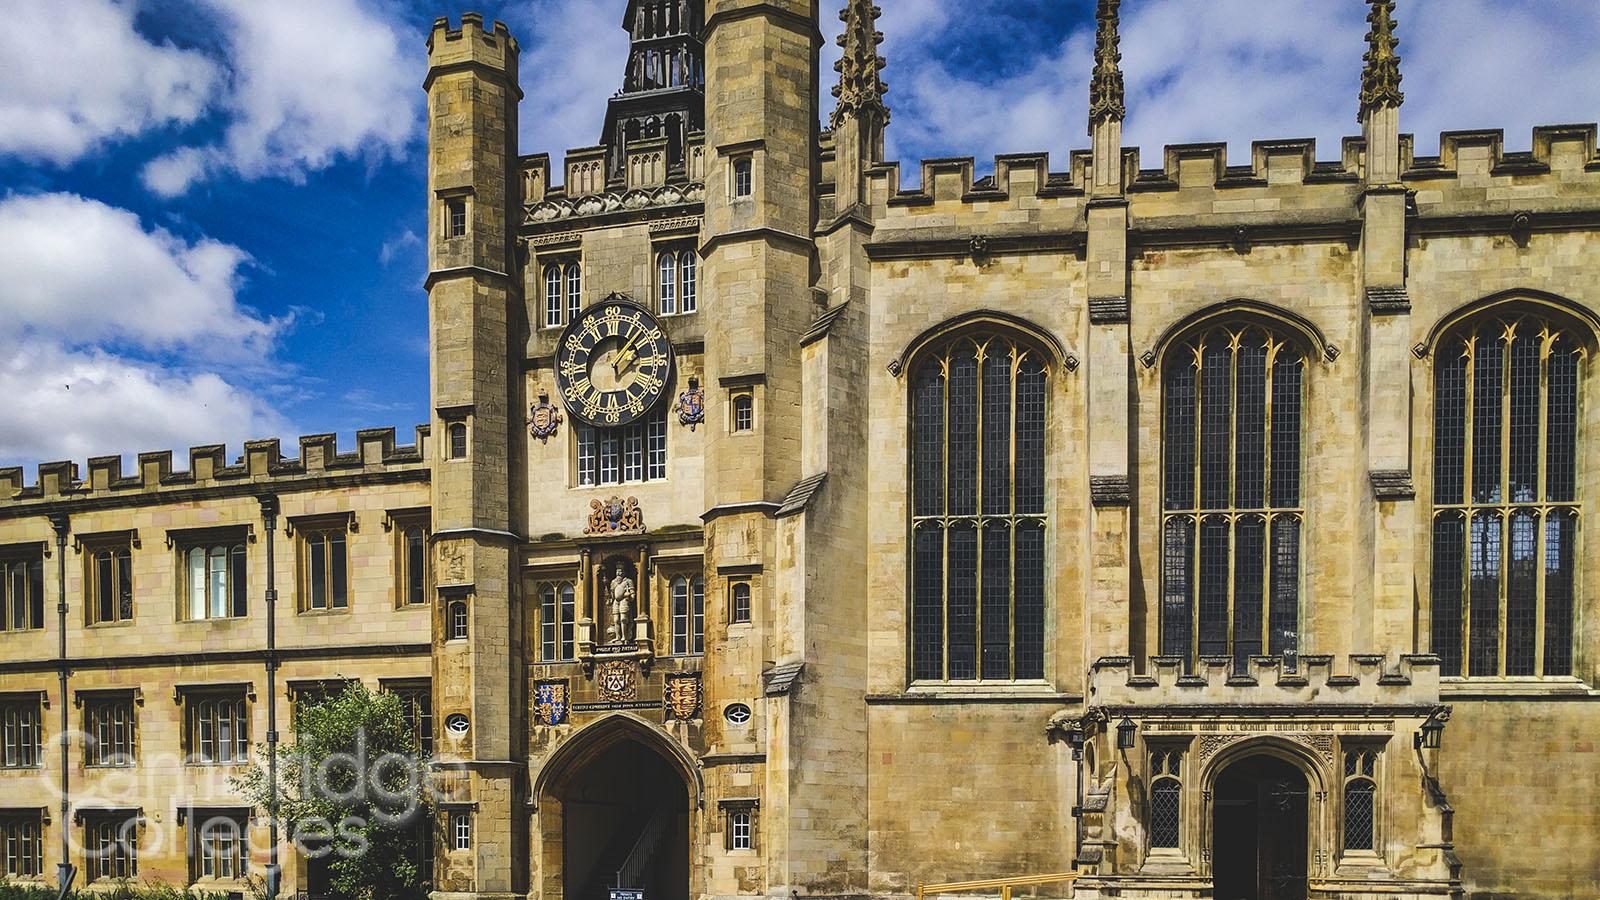 The Clock tower of Trinity collge, Cambridge